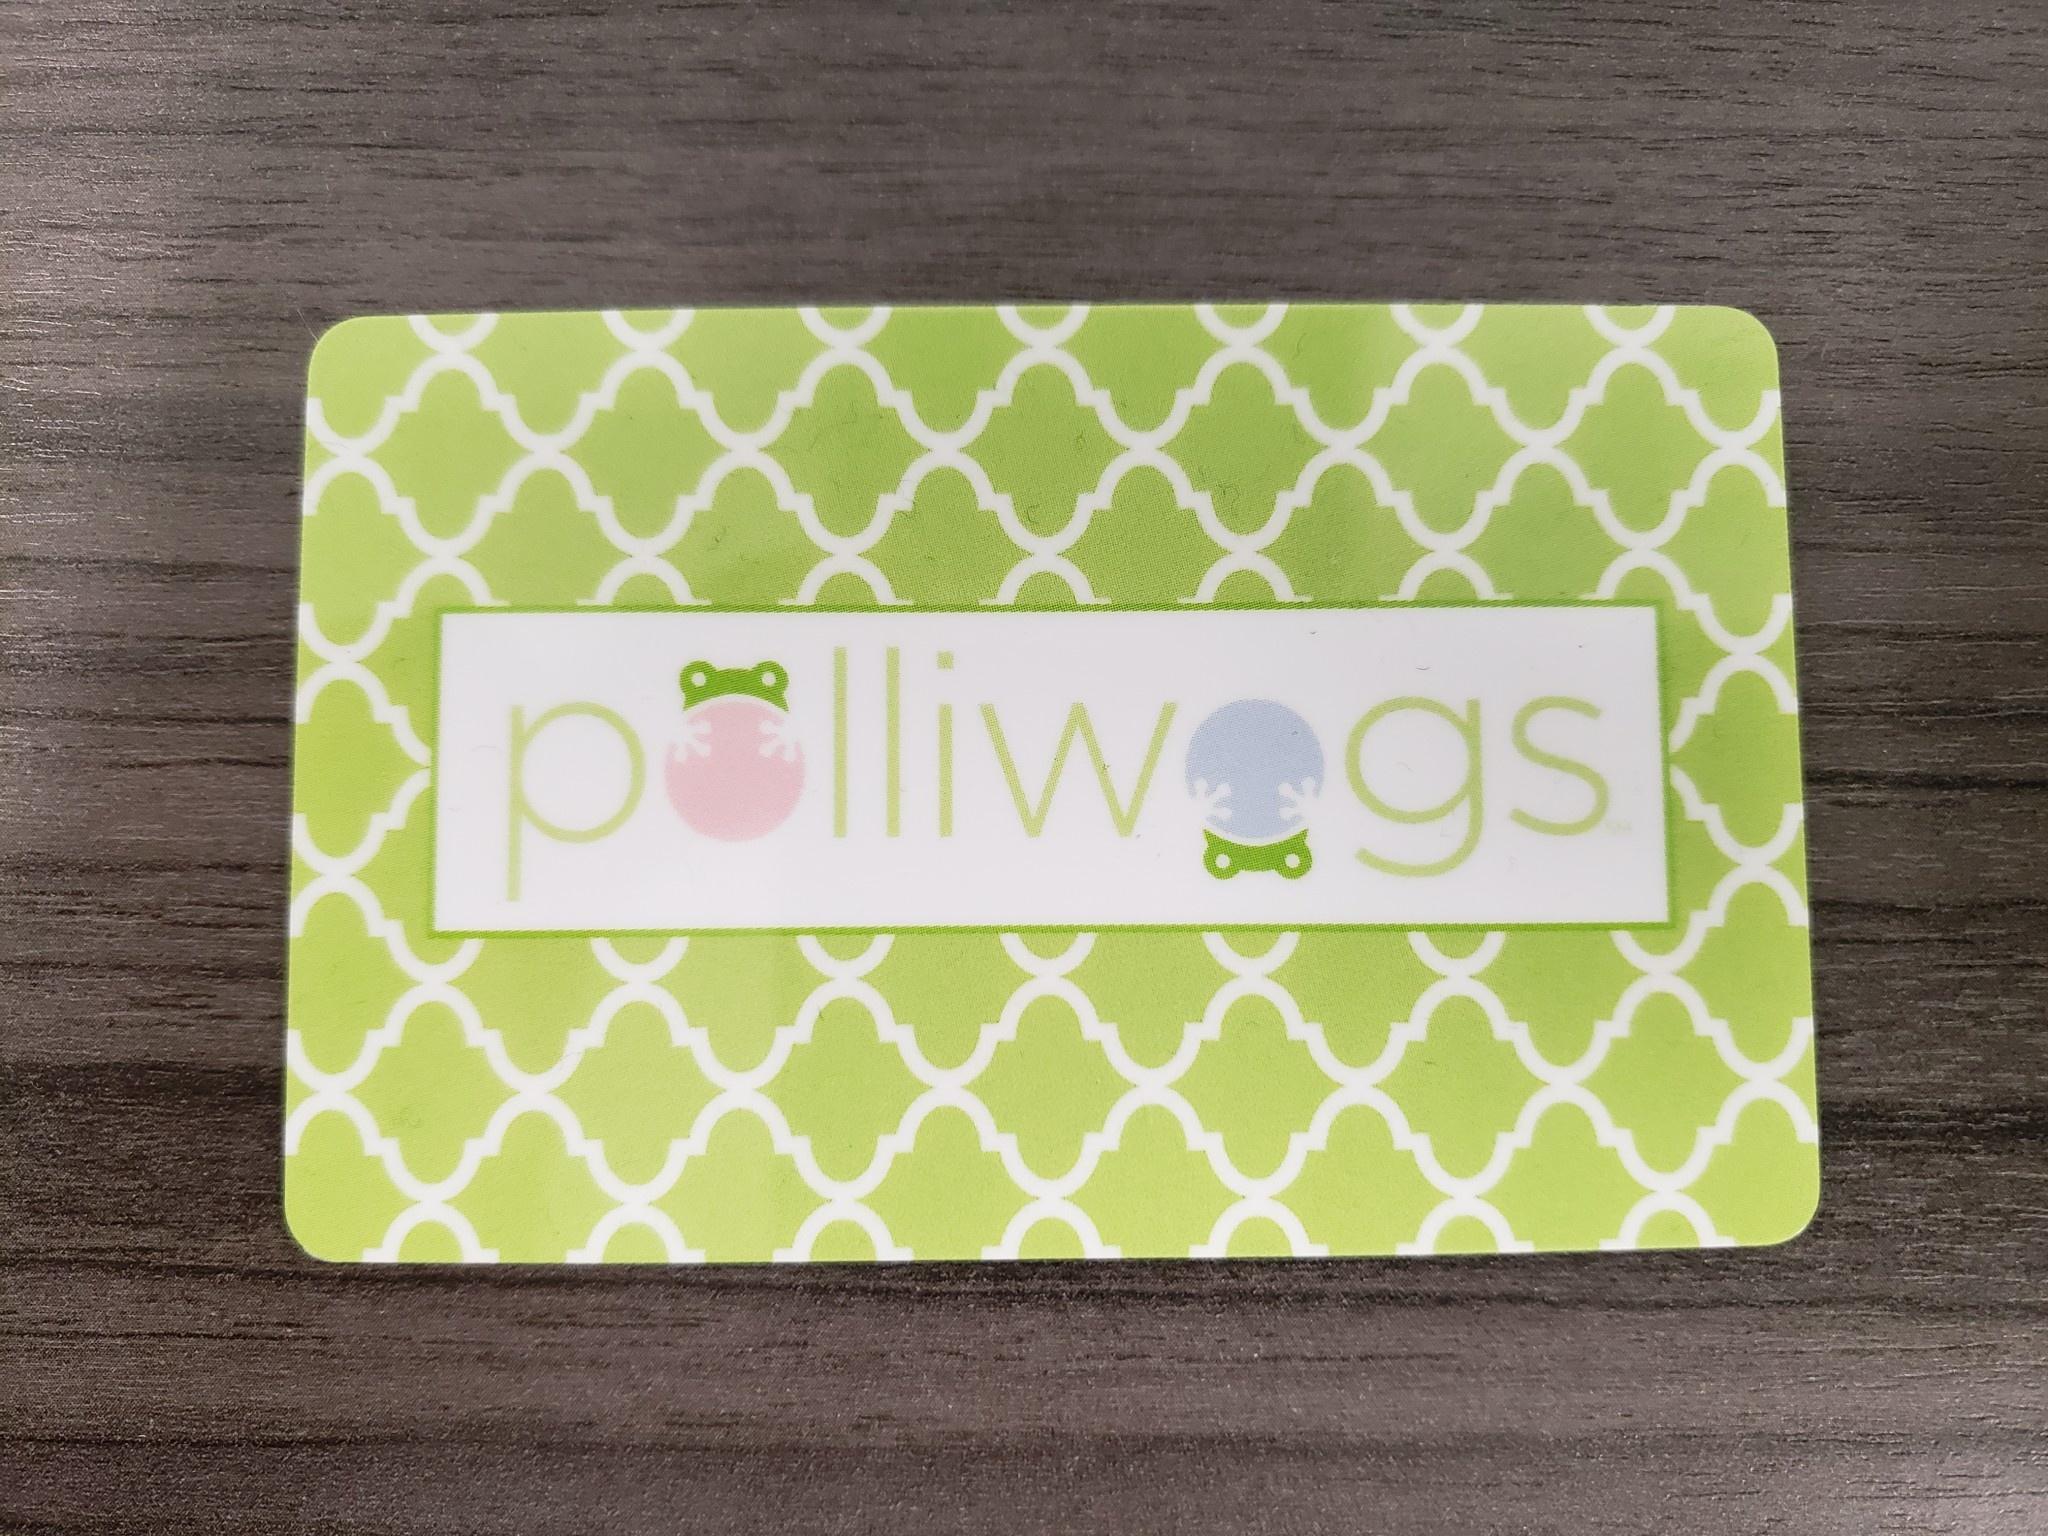 polliwogs Gift Card